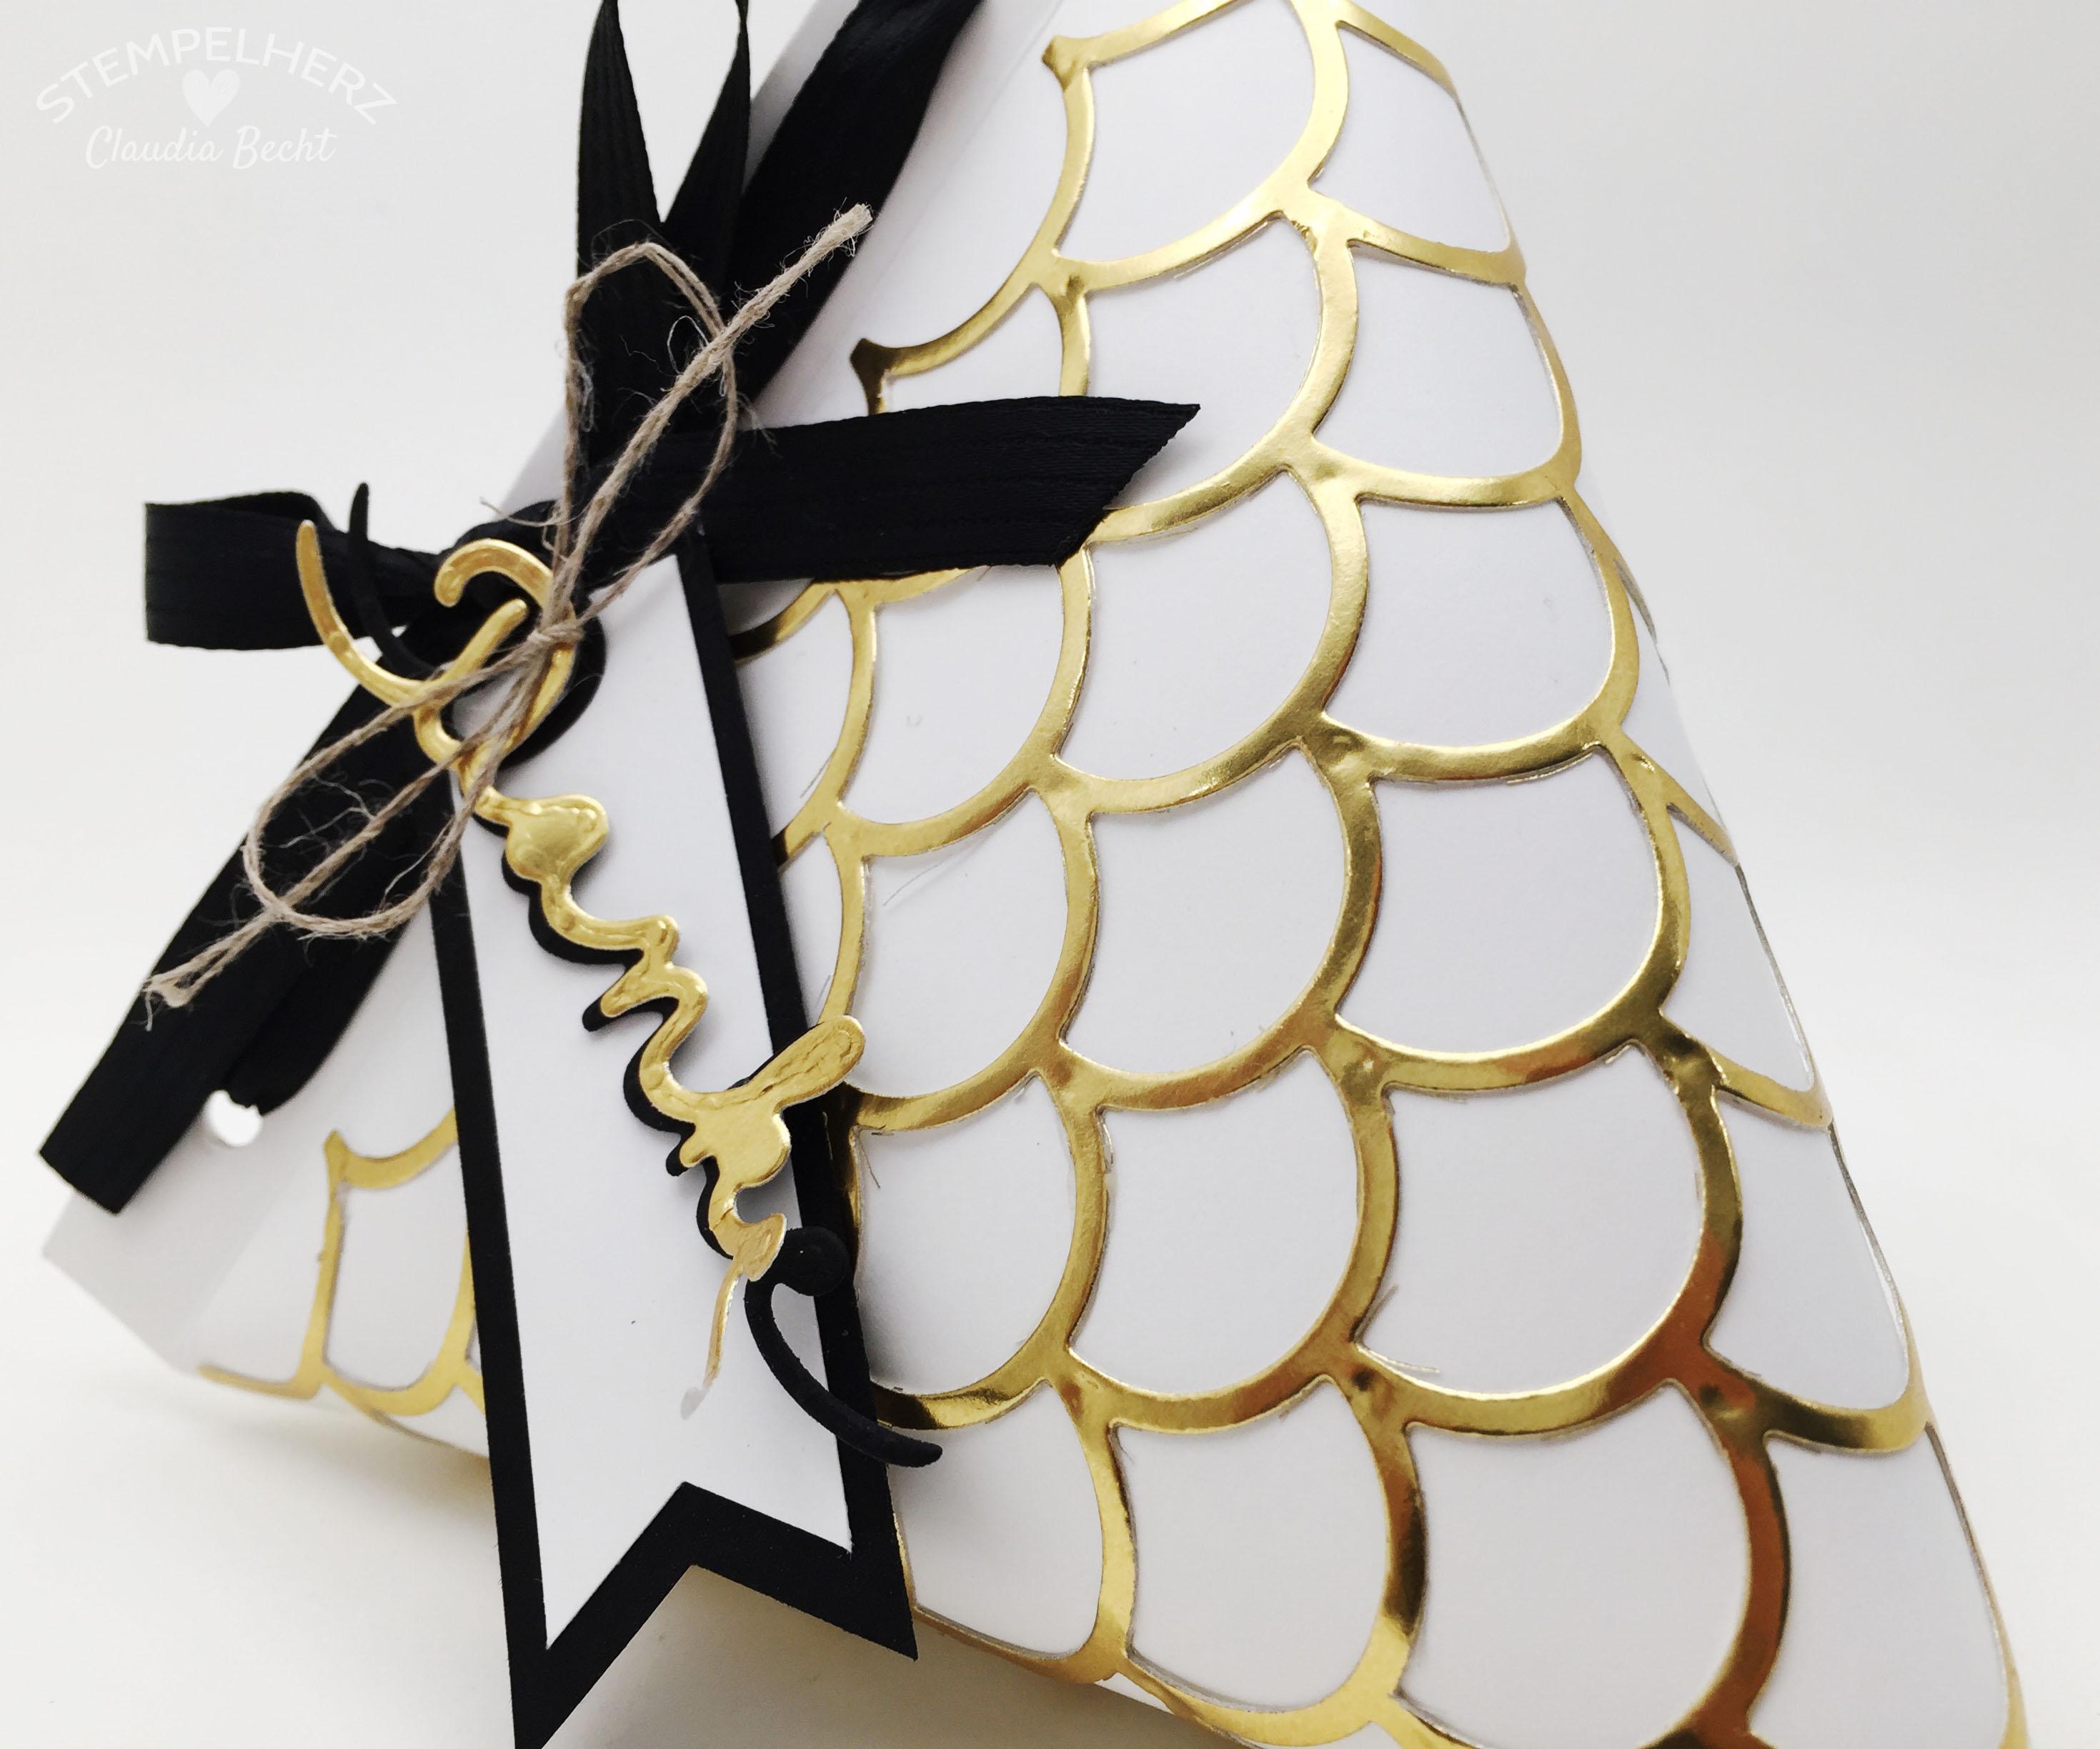 Stampin Up-Stempelherz-Verpackung-Box-Tetra Pak-Verpackung Danke Gold-Schwarz-Weiß 06b